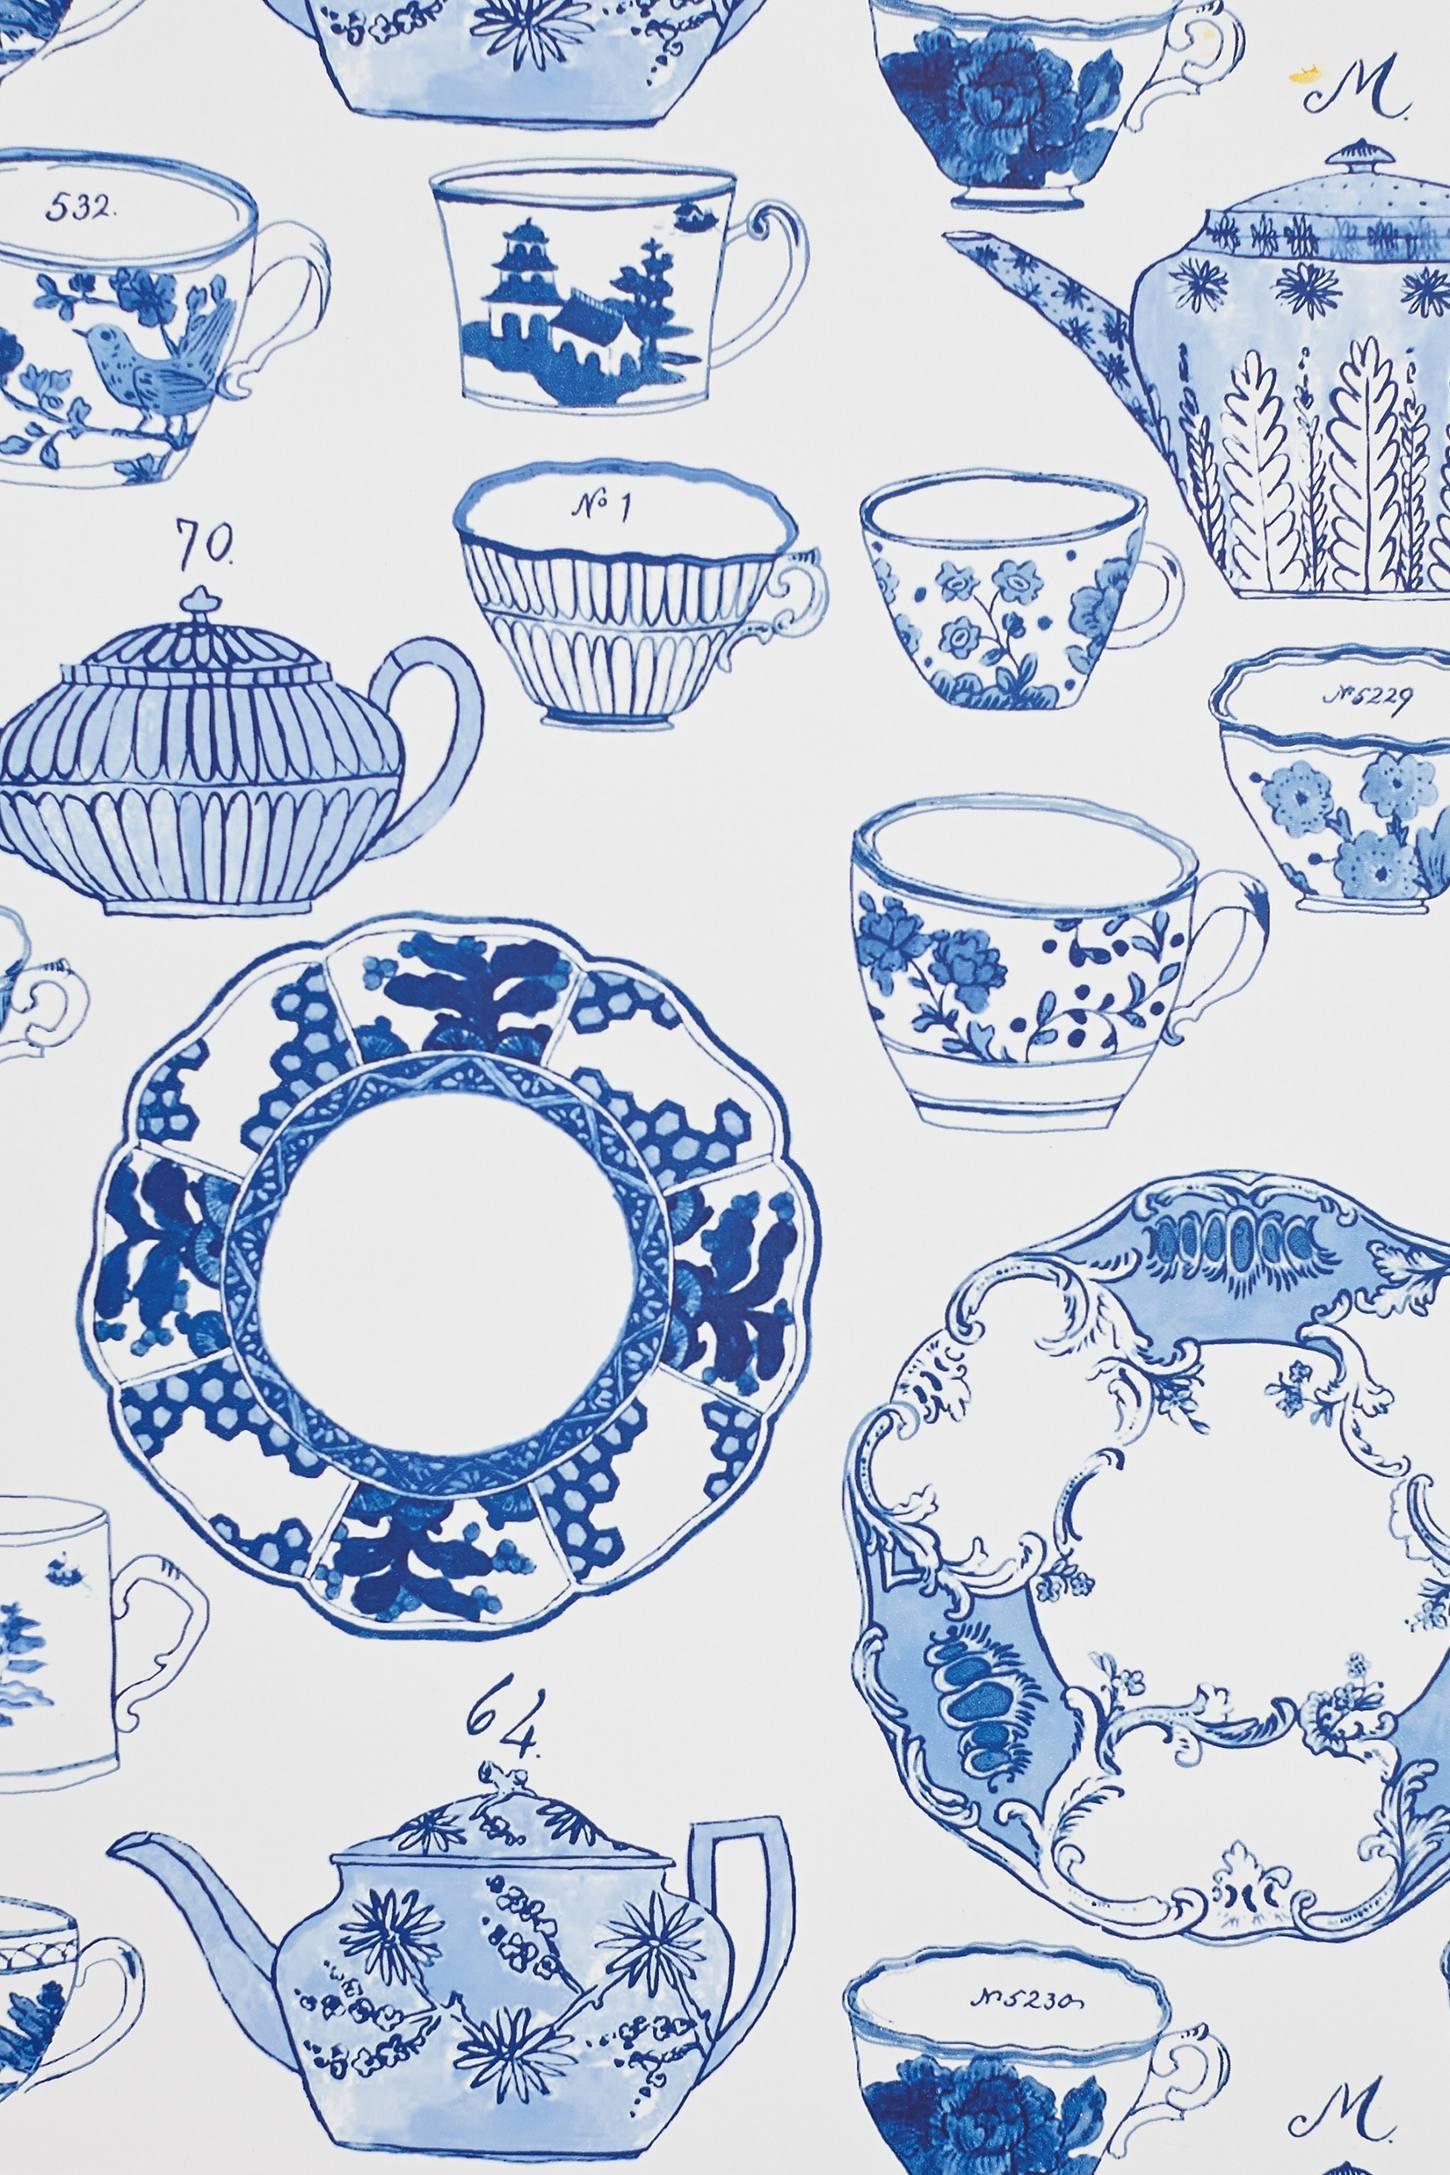 Delft Dinnerware Wallpaper - anthropologie.com  sc 1 st  Pinterest & Delft Dinnerware Wallpaper - anthropologie.com | Home | Pinterest ...